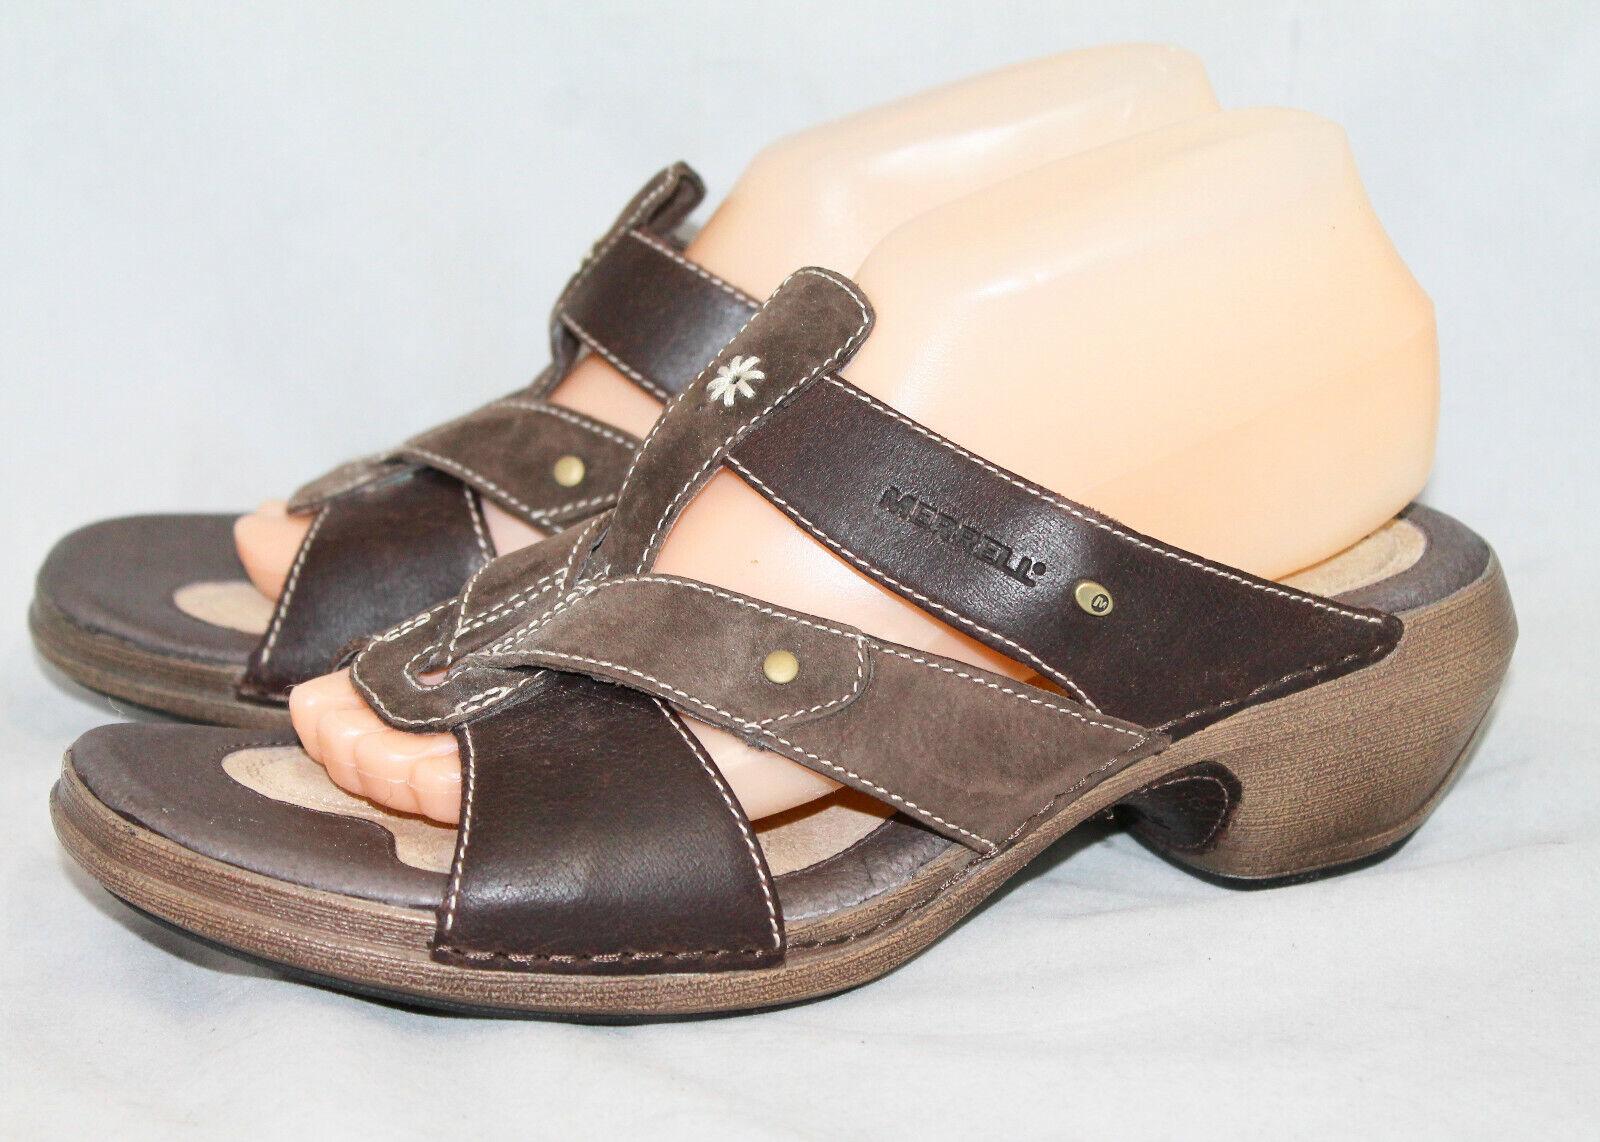 MERRELL Luxe Slide Sandals J89396 Wo's 9 Coffee Brown Leather Medium Heel